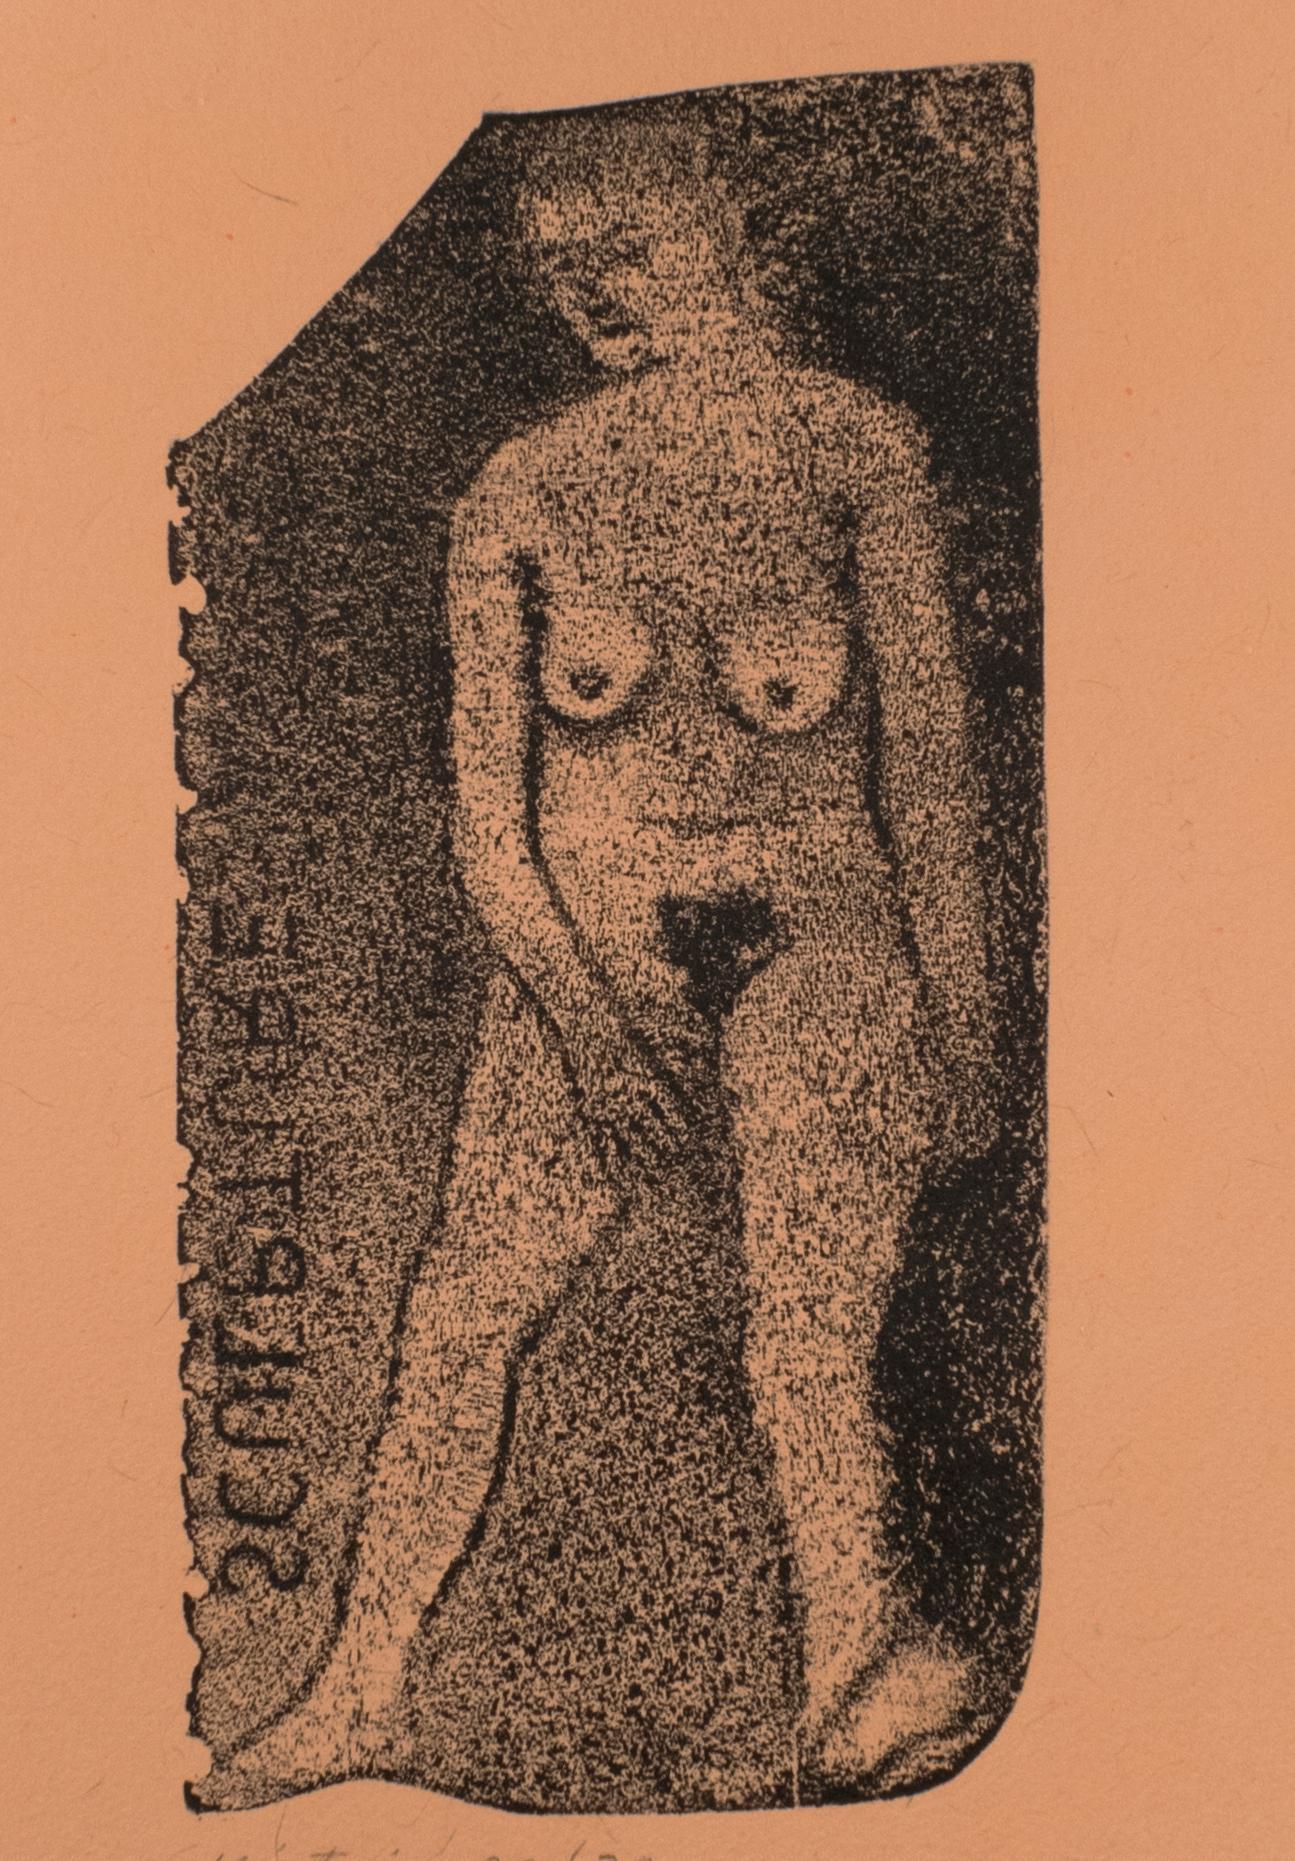 Nude Sculpture R.B. Kitaj drawing of nude woman on handmade orange paper print